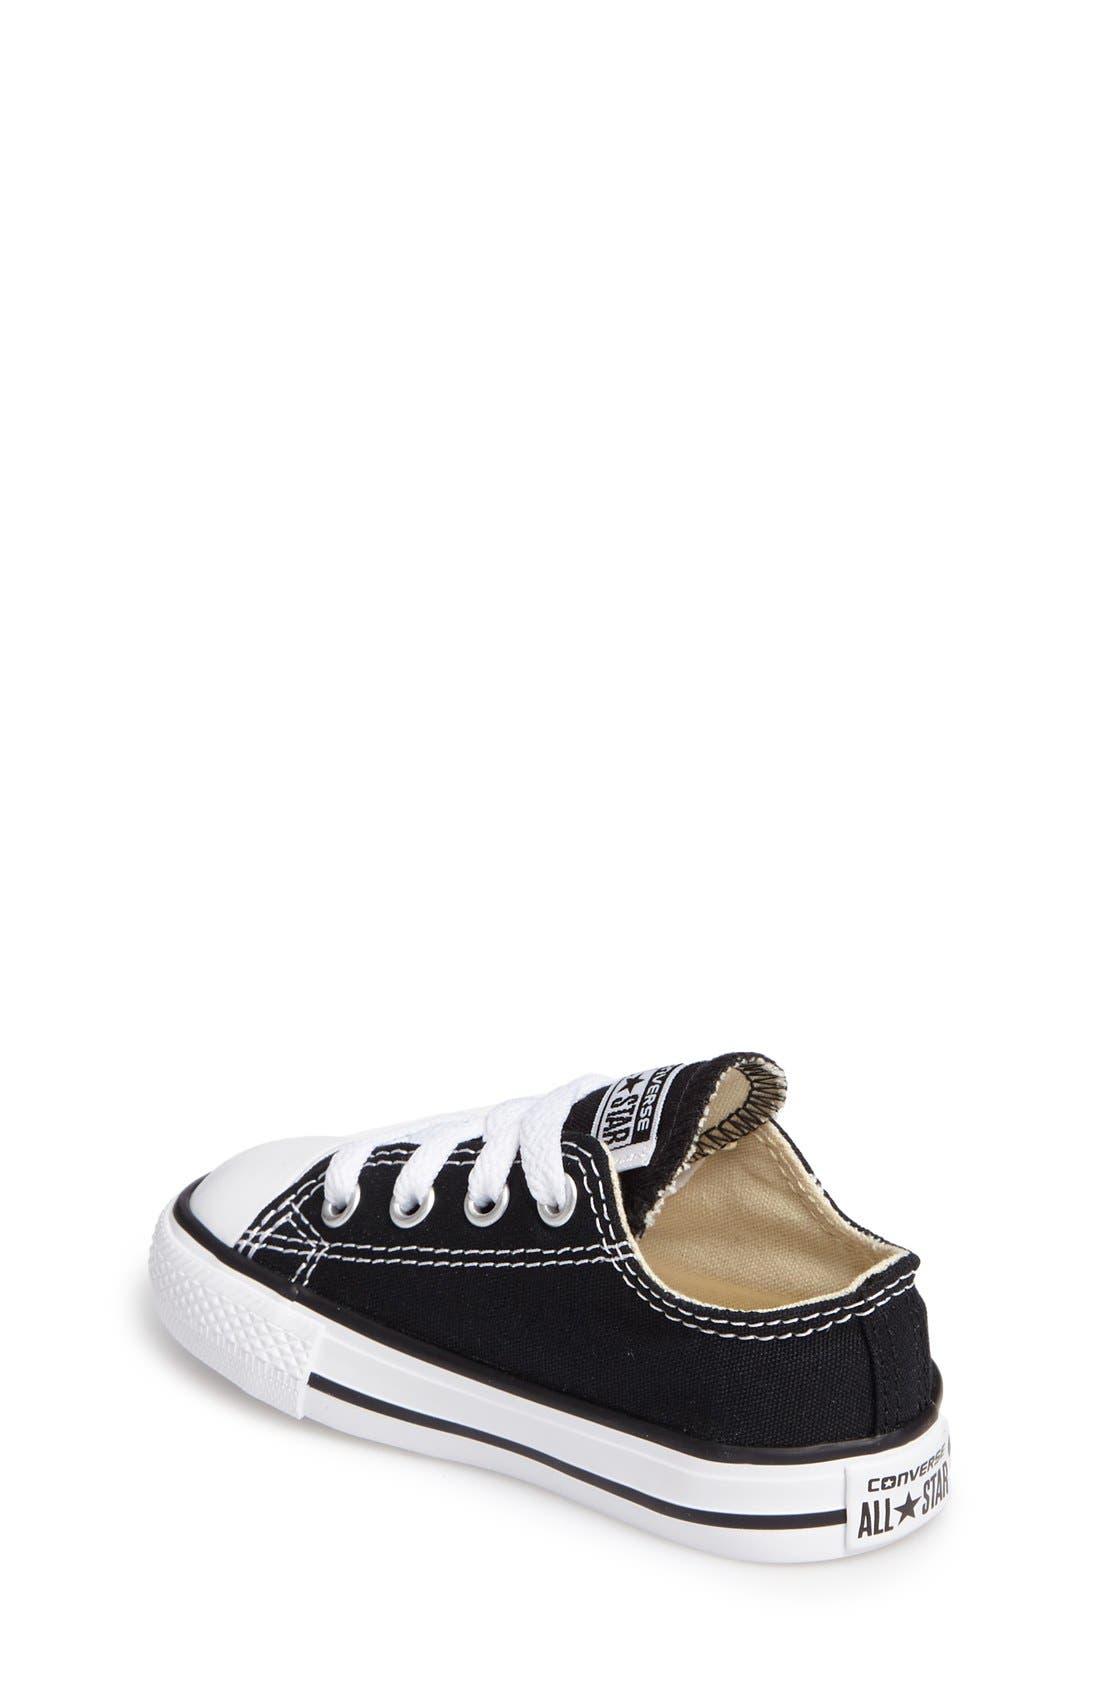 CONVERSE,                             Chuck Taylor<sup>®</sup> Low Top Sneaker,                             Alternate thumbnail 2, color,                             BLACK